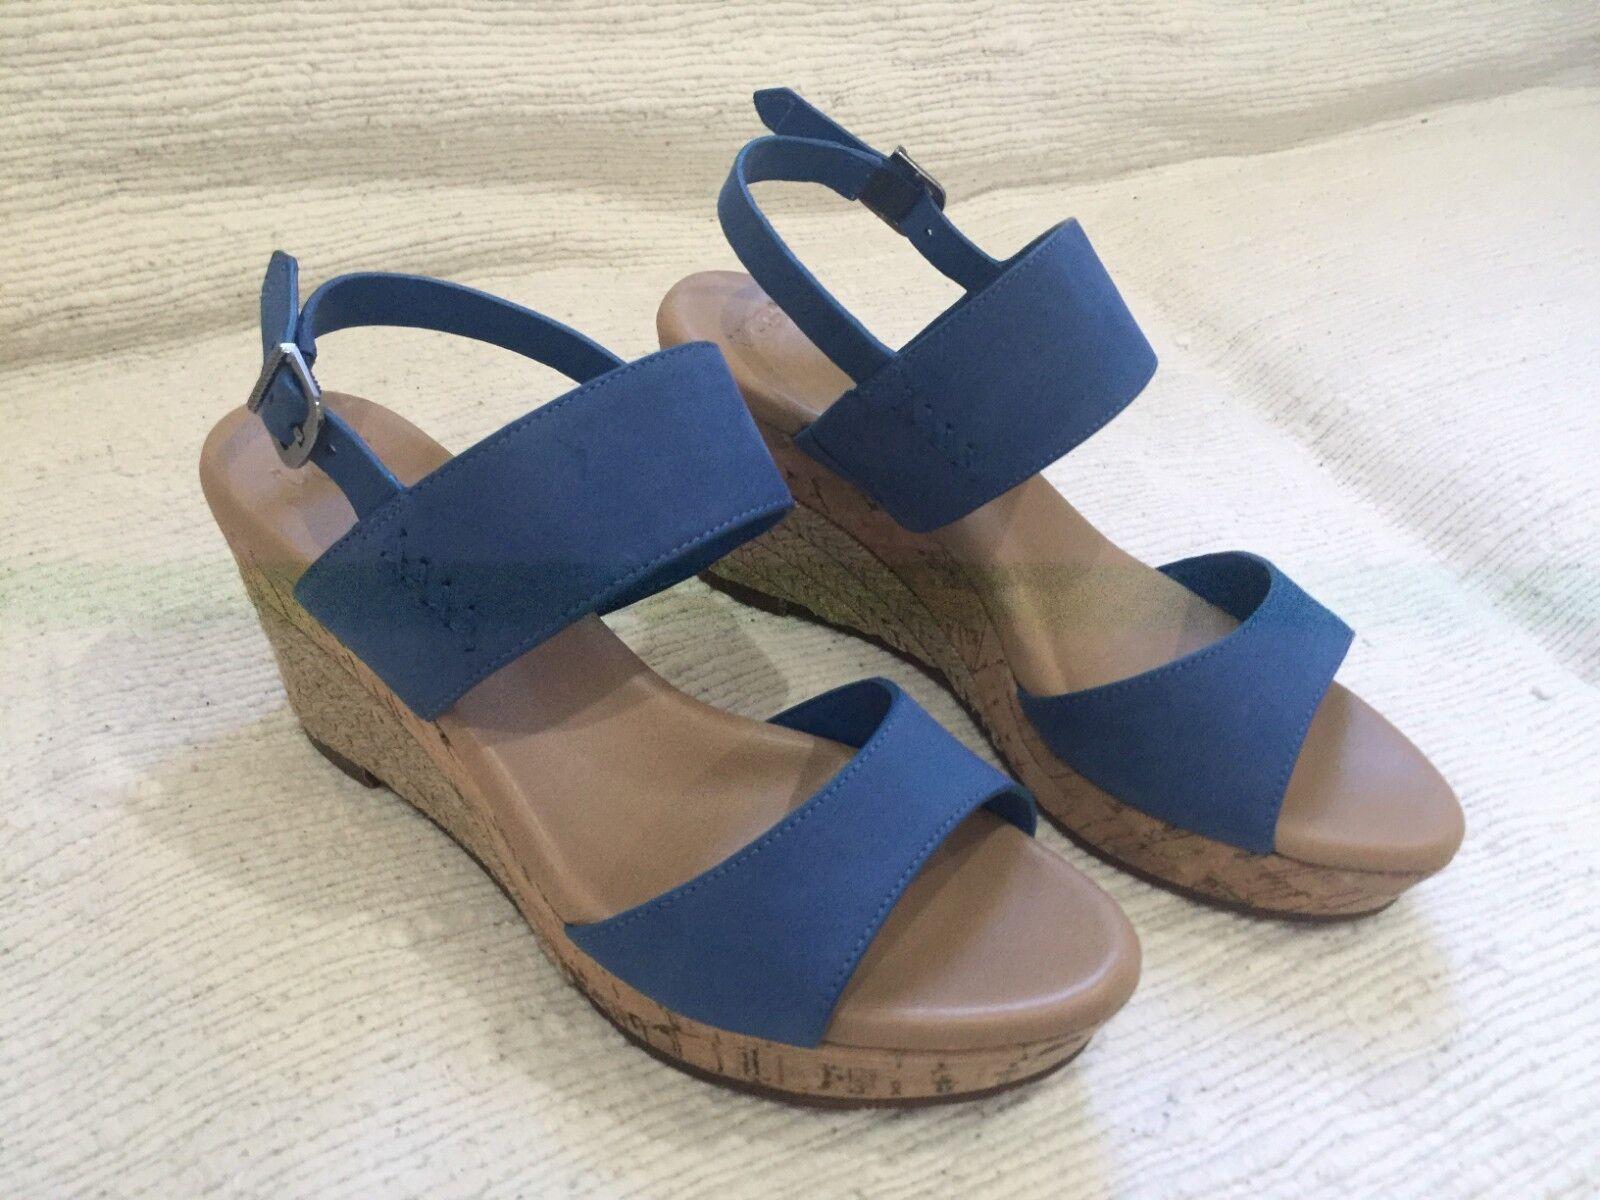 UGG Australia Femme Elena - Sandales à plateforme et sandales Azul 1015098 en jute de liège